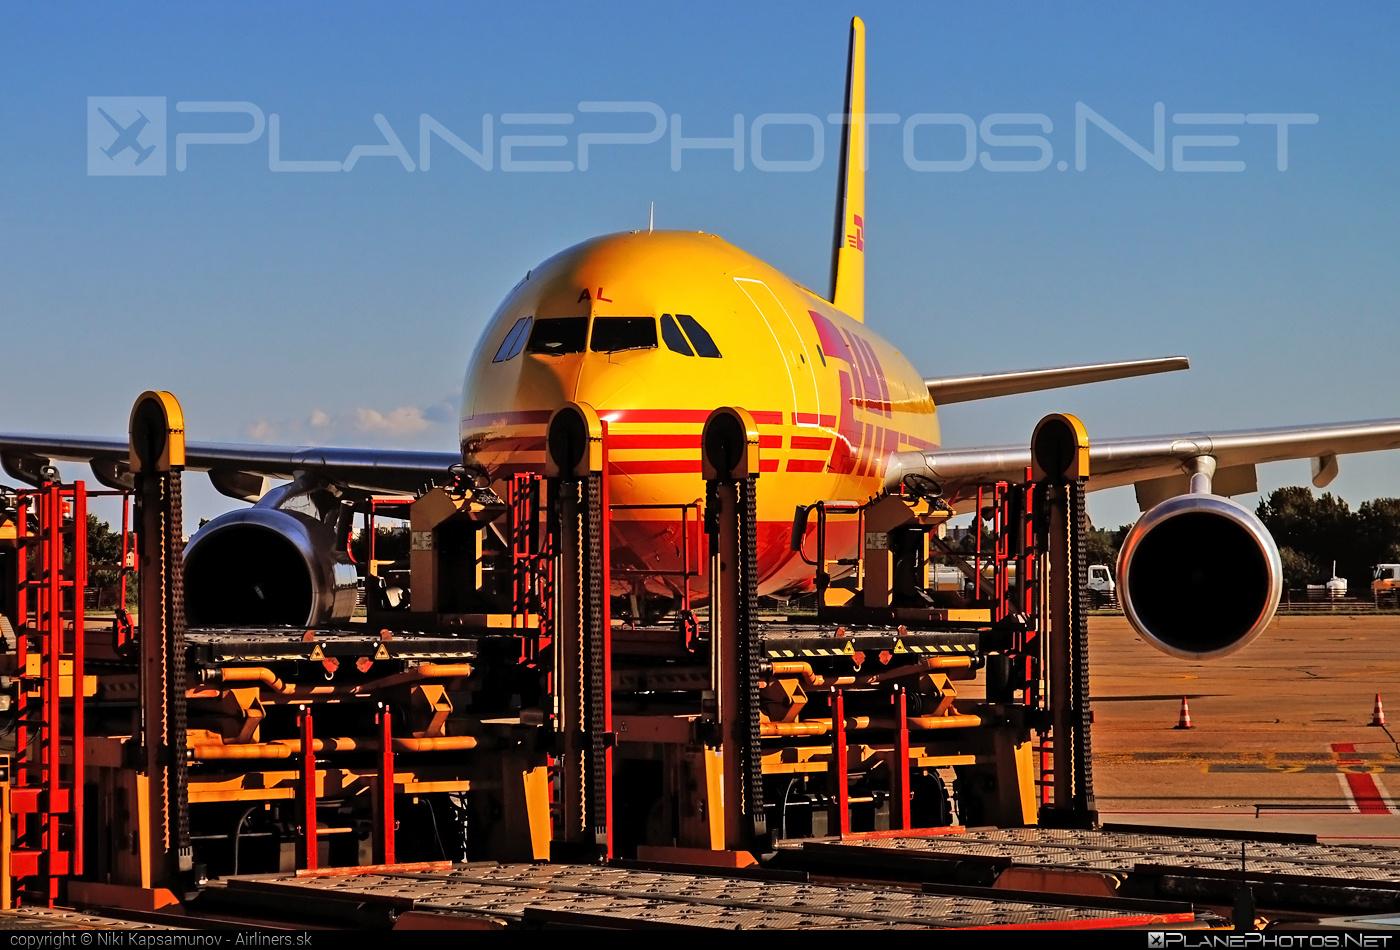 Airbus A300B4-622RF - D-AEAL operated by DHL (European Air Transport) #a300 #airbus